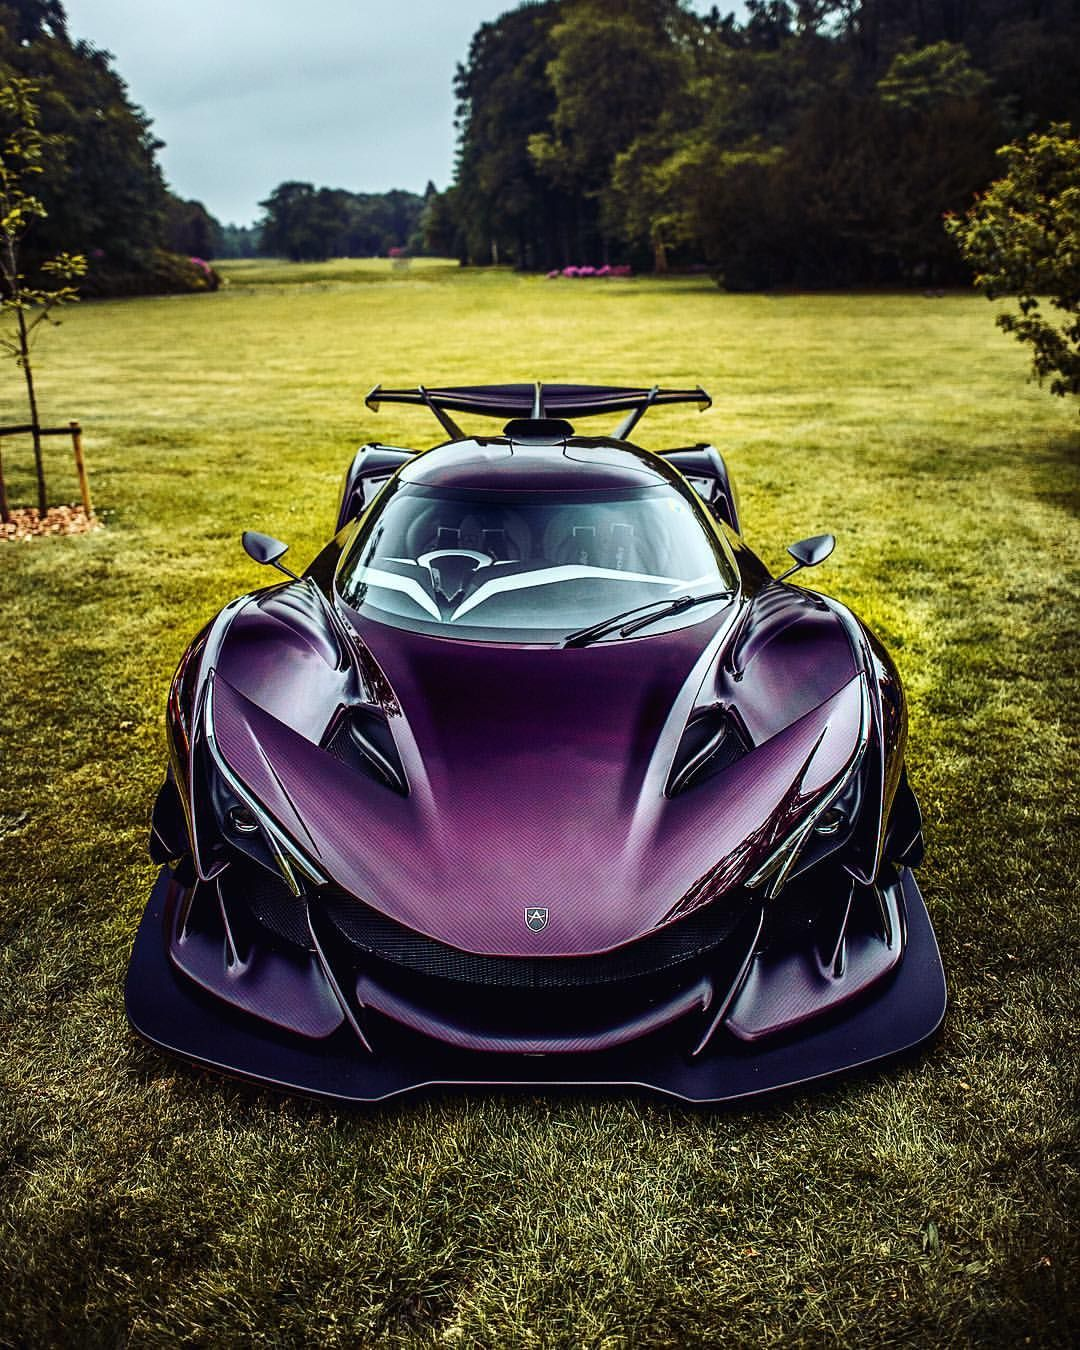 Awesome Shot Of The Purple Dragon By Ccourjon Apolloie Apolloautomobil Assen Supercarsunday Hypercar Purpledr Super Cars Apollo Car Truck Accessories